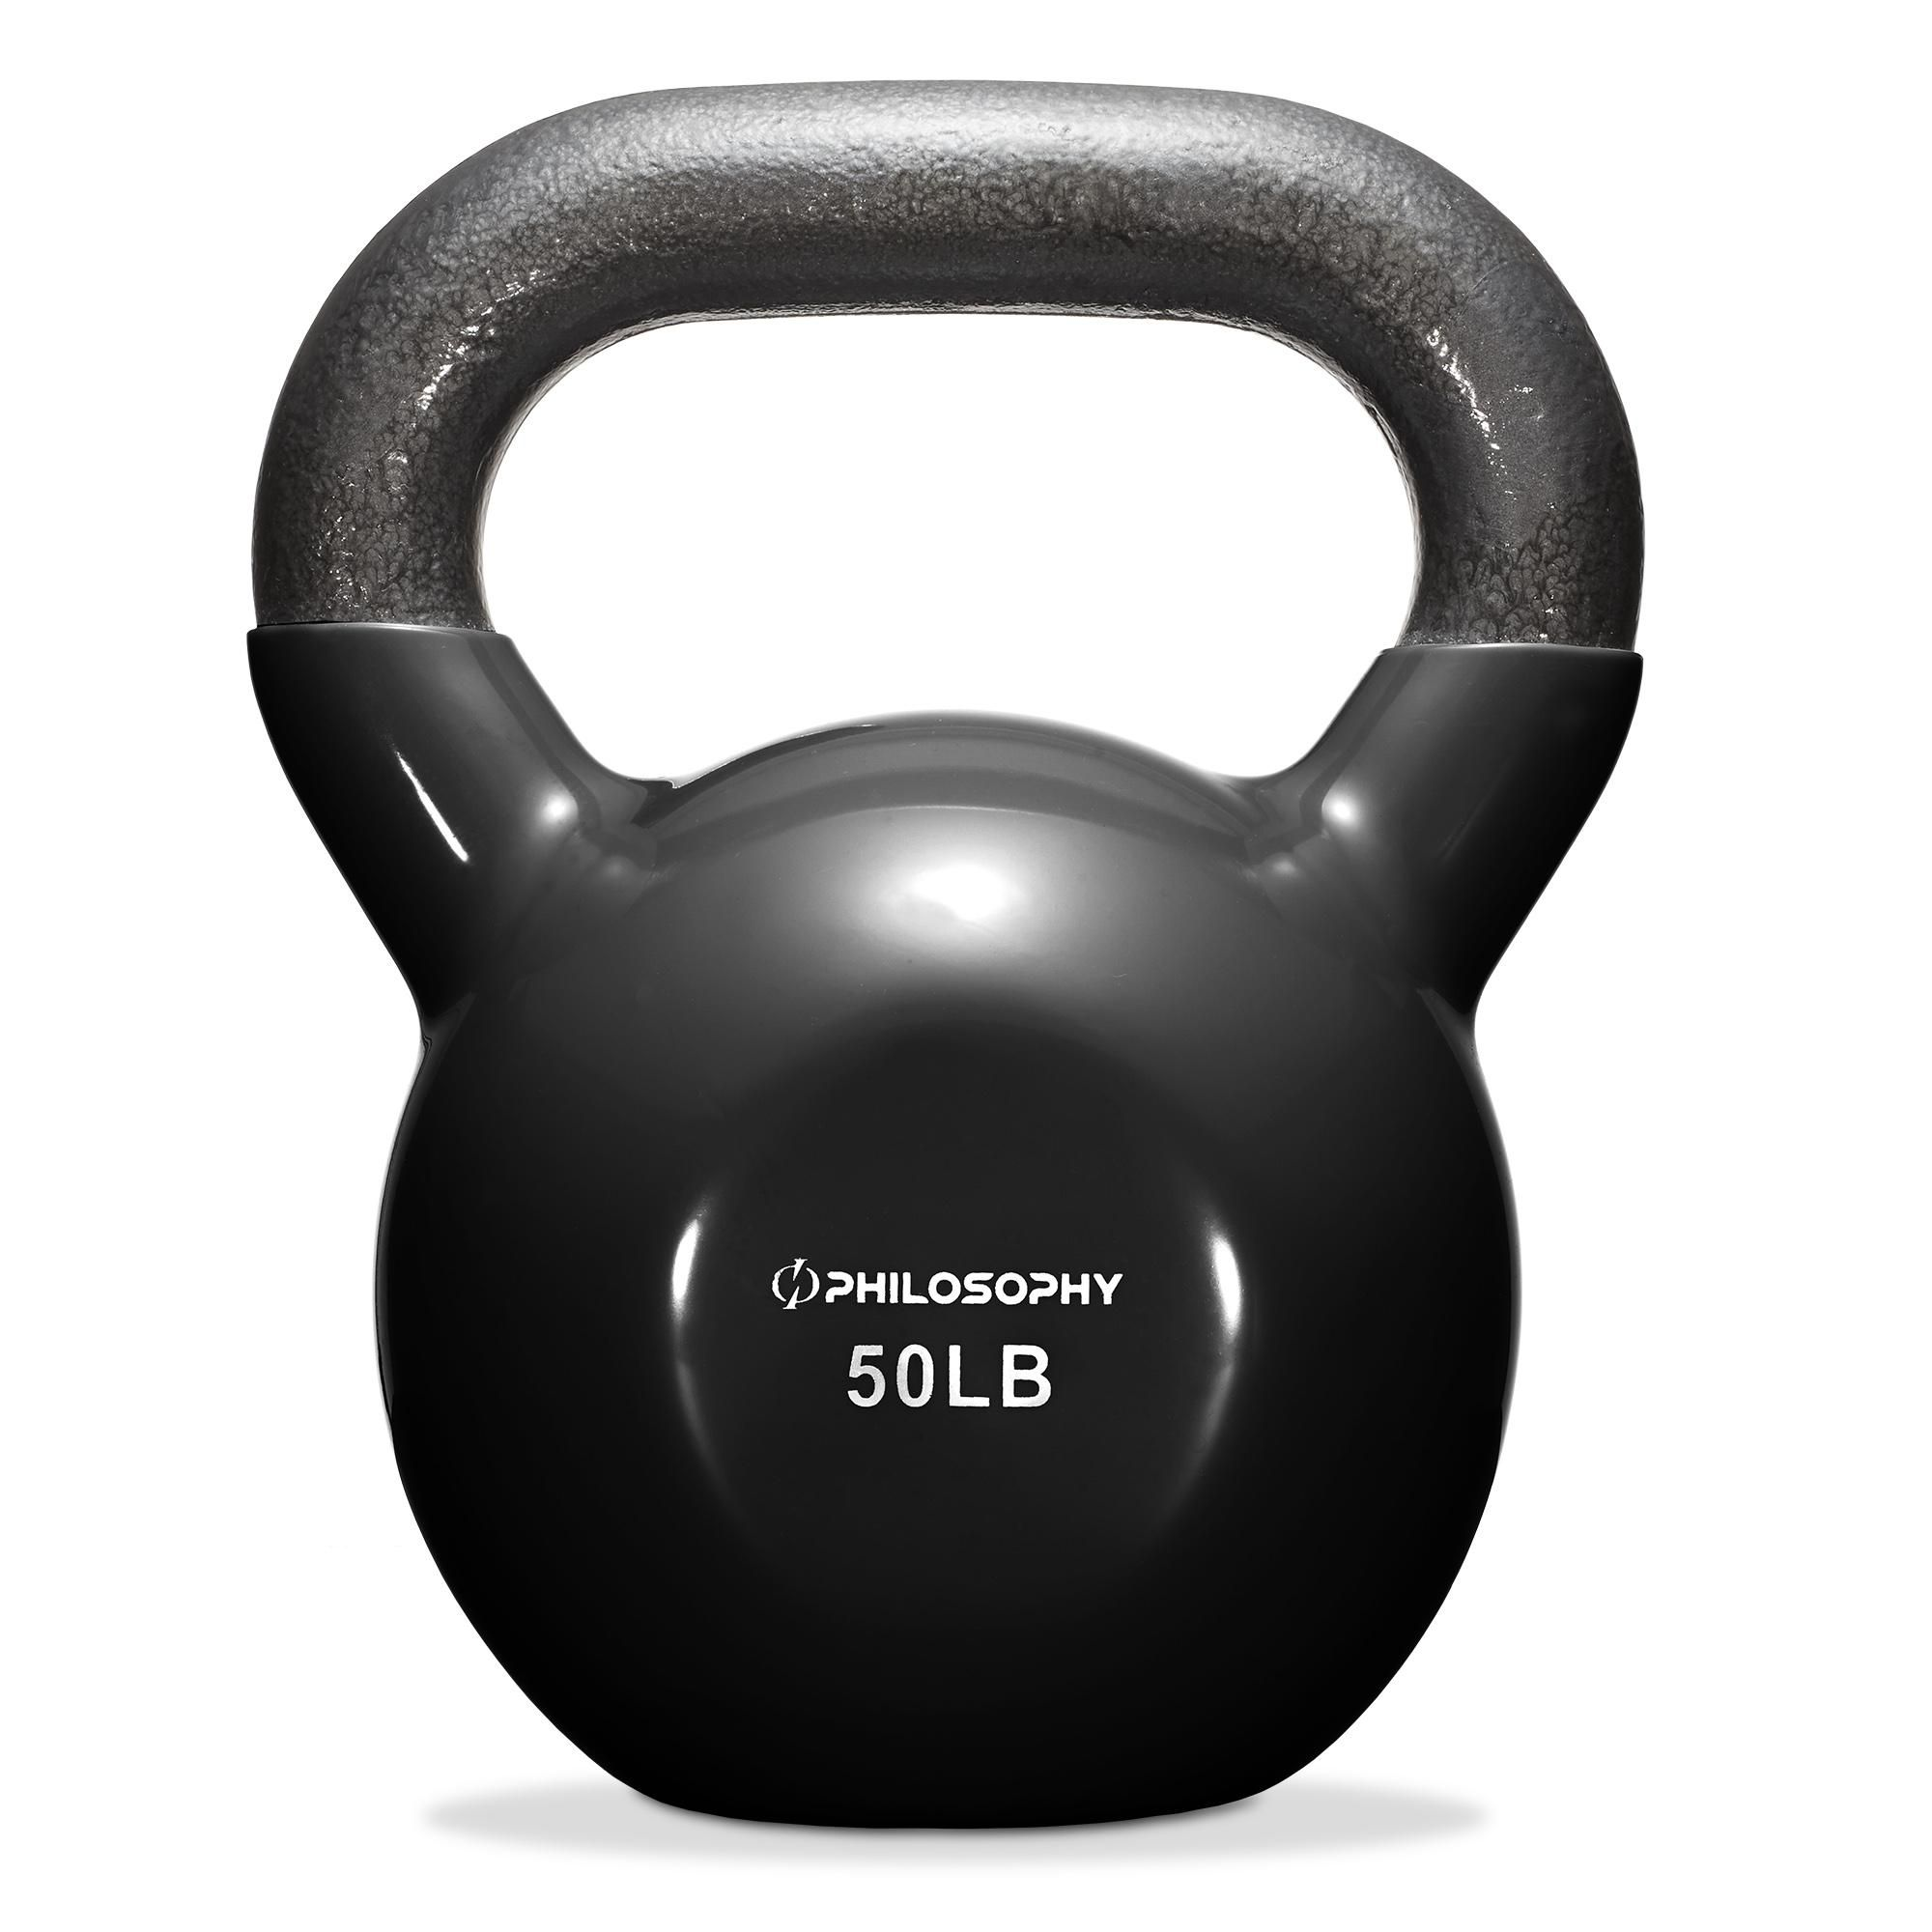 Philosophy Gym Vinyl Coated Cast Iron Kettlebell Weight 50 lbs - Black